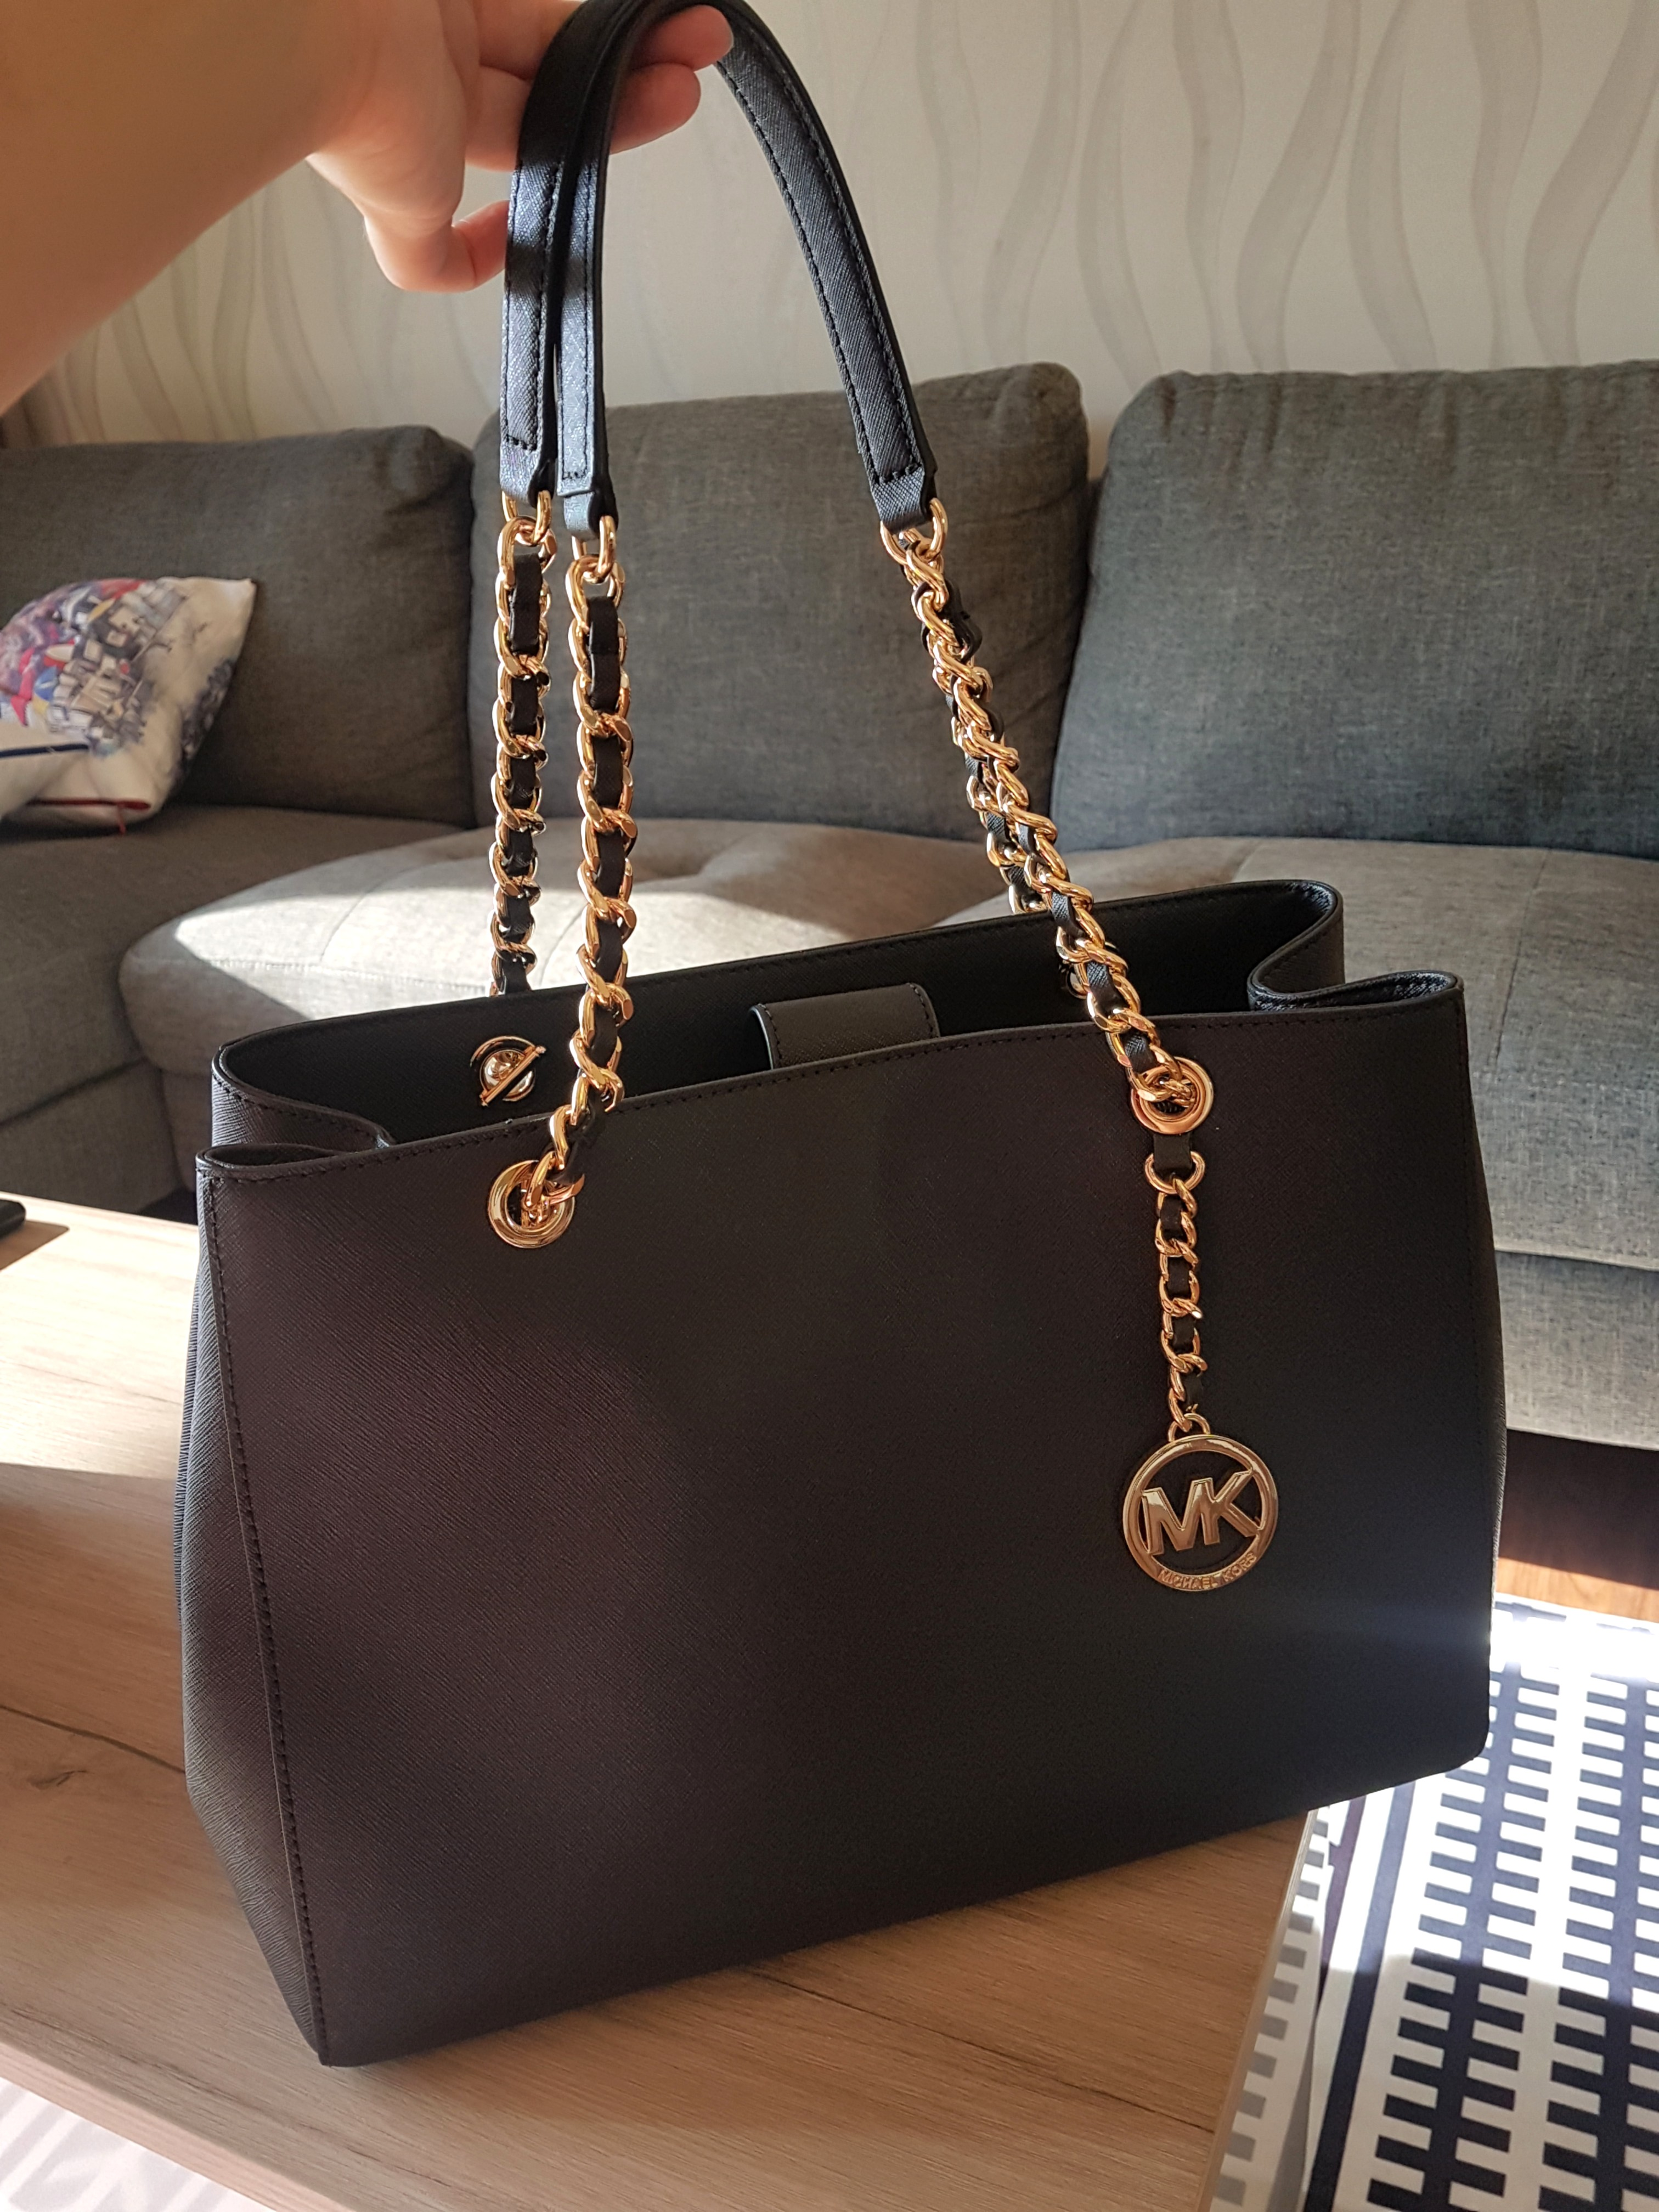 4cb248728 Michael Kors Bag, Luxury, Bags & Wallets, Handbags on Carousell